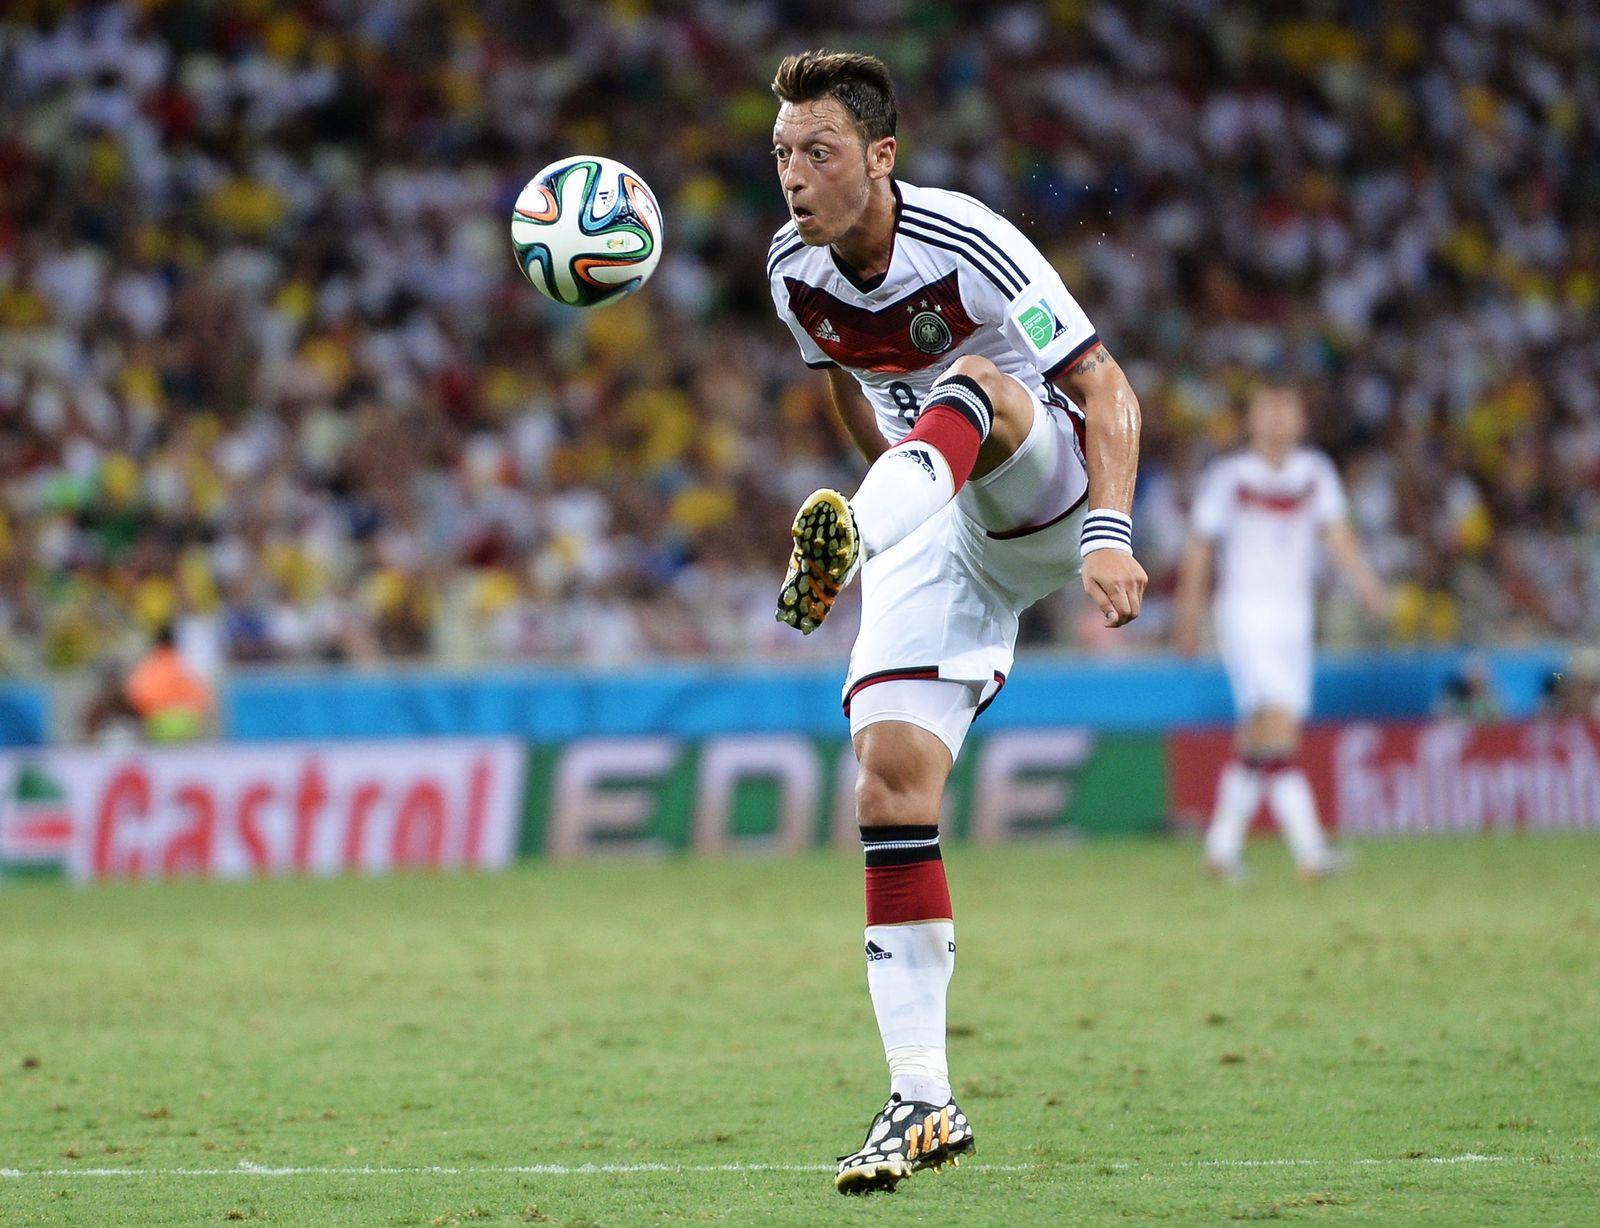 World Cup 2014 - Group G - Germany vs Ghana